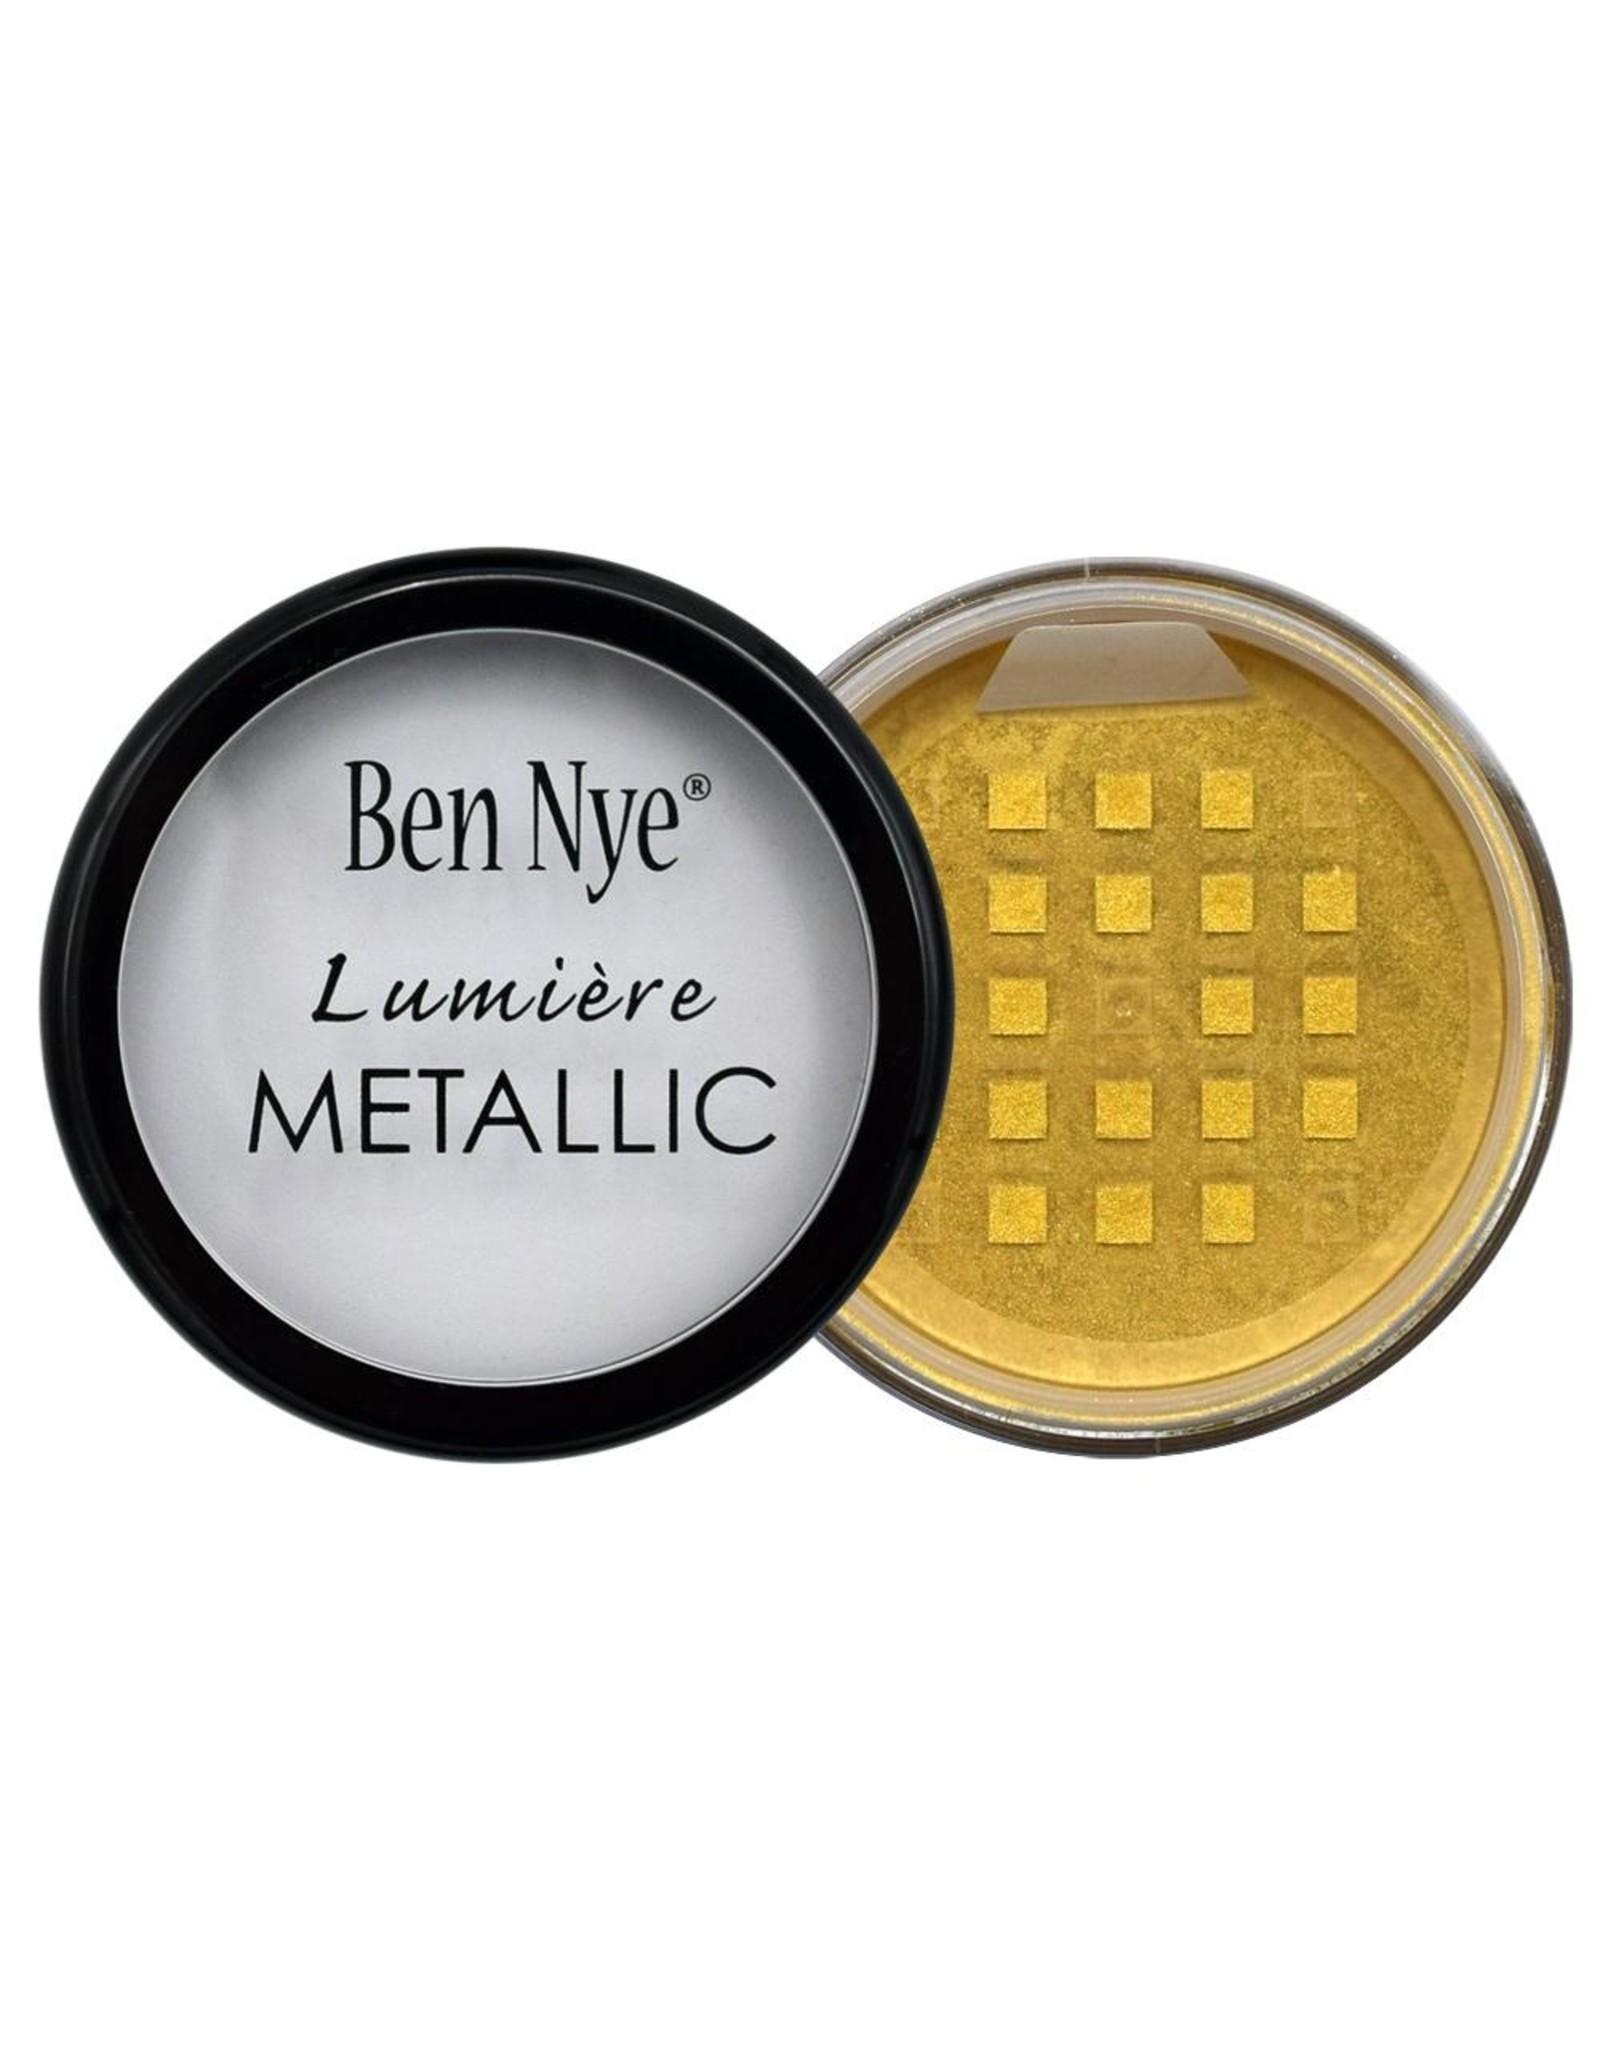 Ben Nye Lumiere Metallic Powder Gold